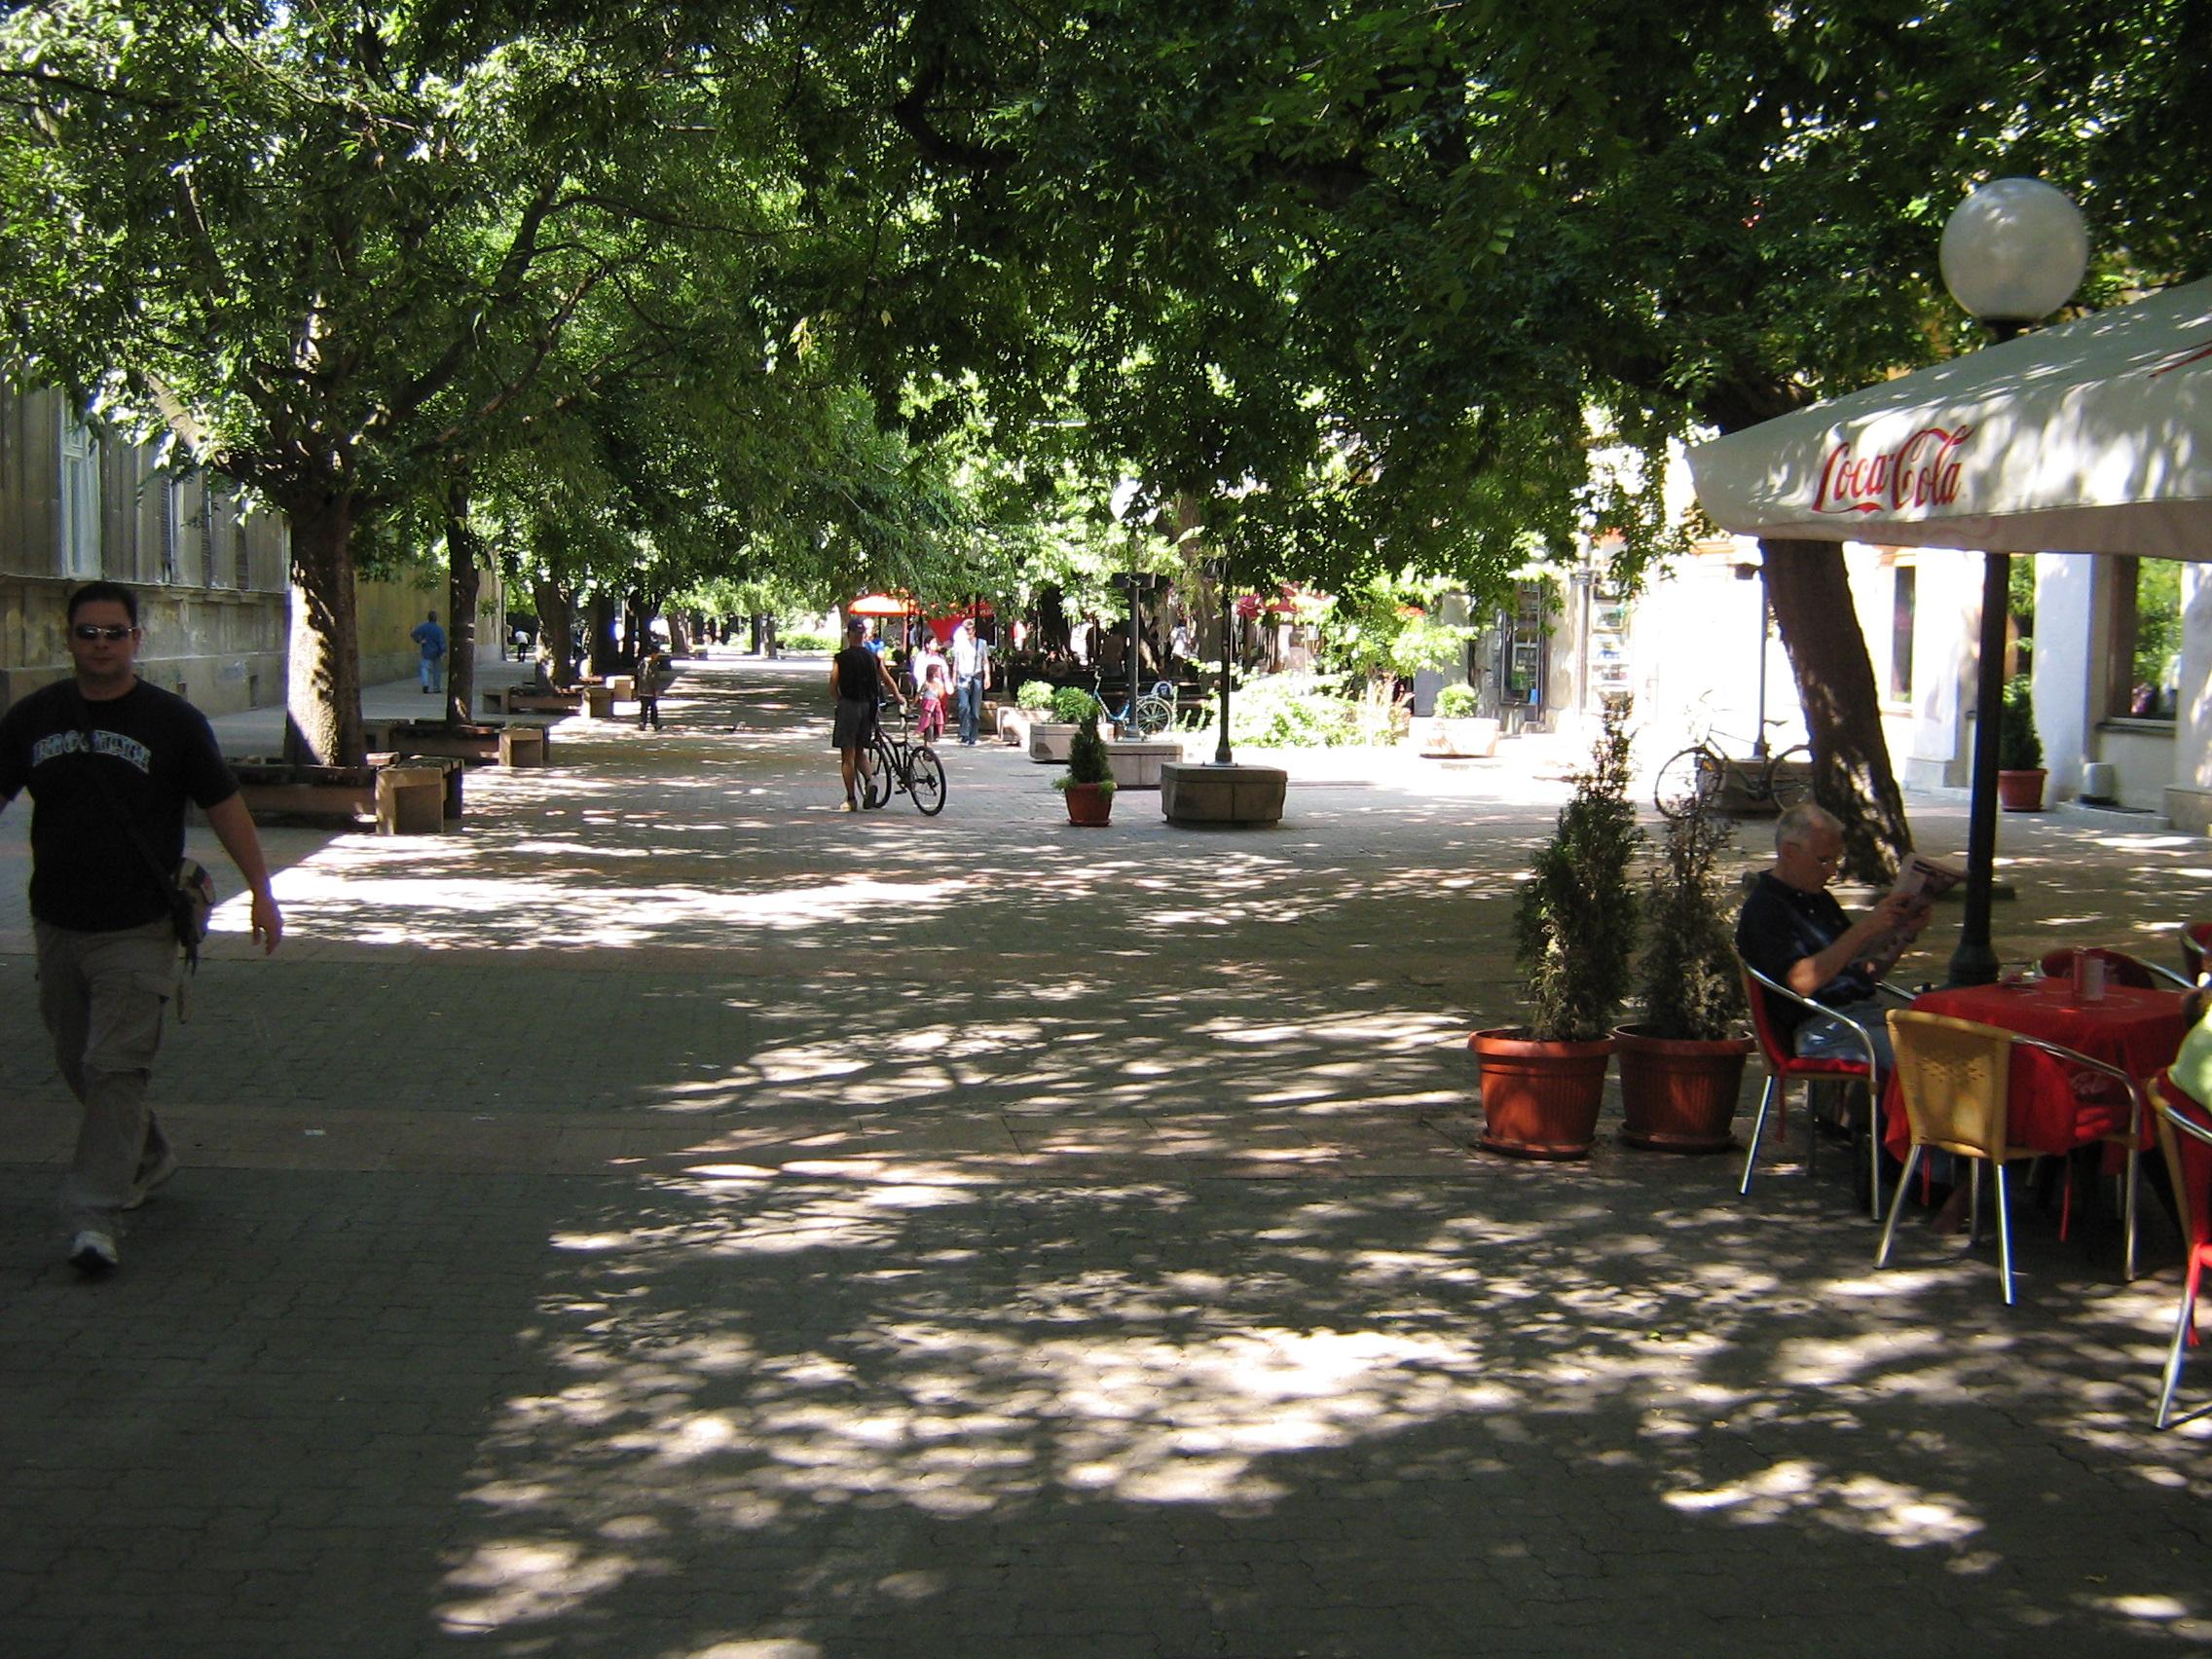 Grad Pancevo - Page 7 Pancevo-narodni_front_street